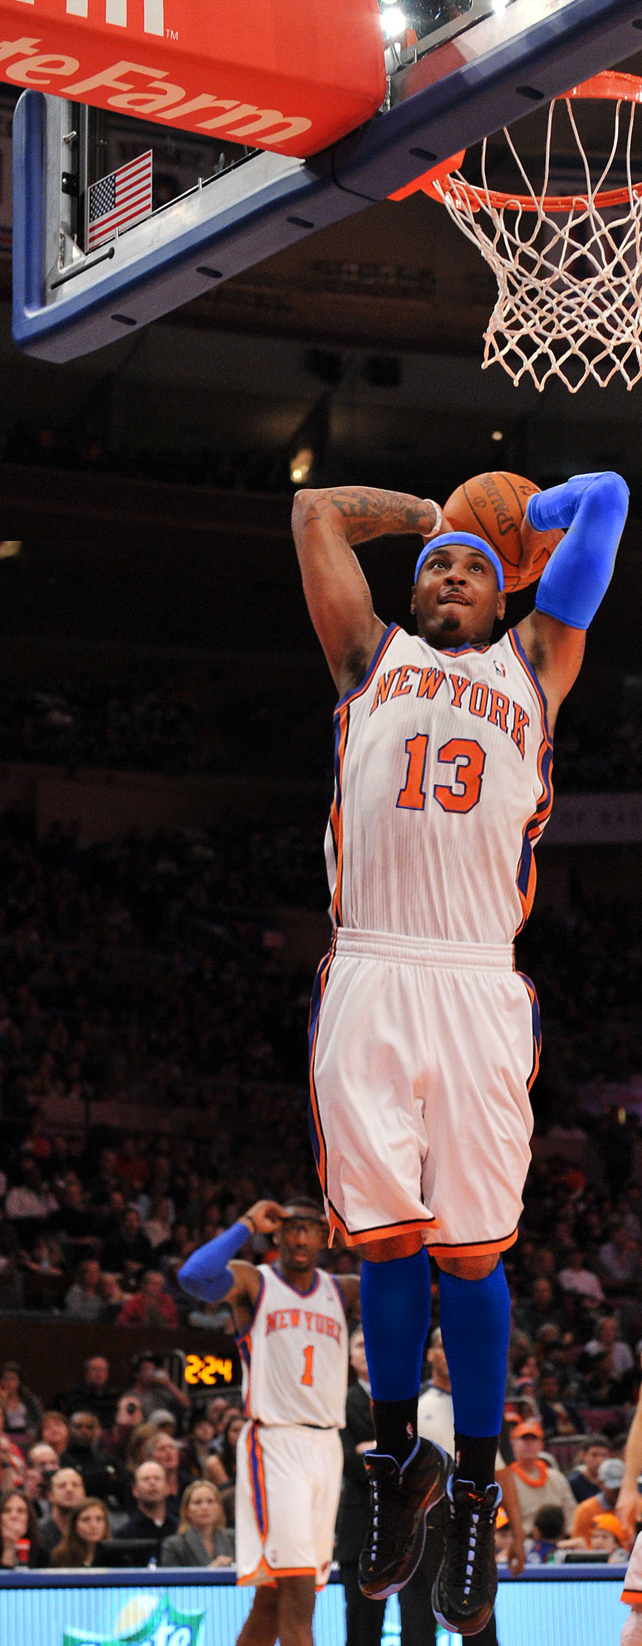 Carmelo Anthony Knicks by rhurst